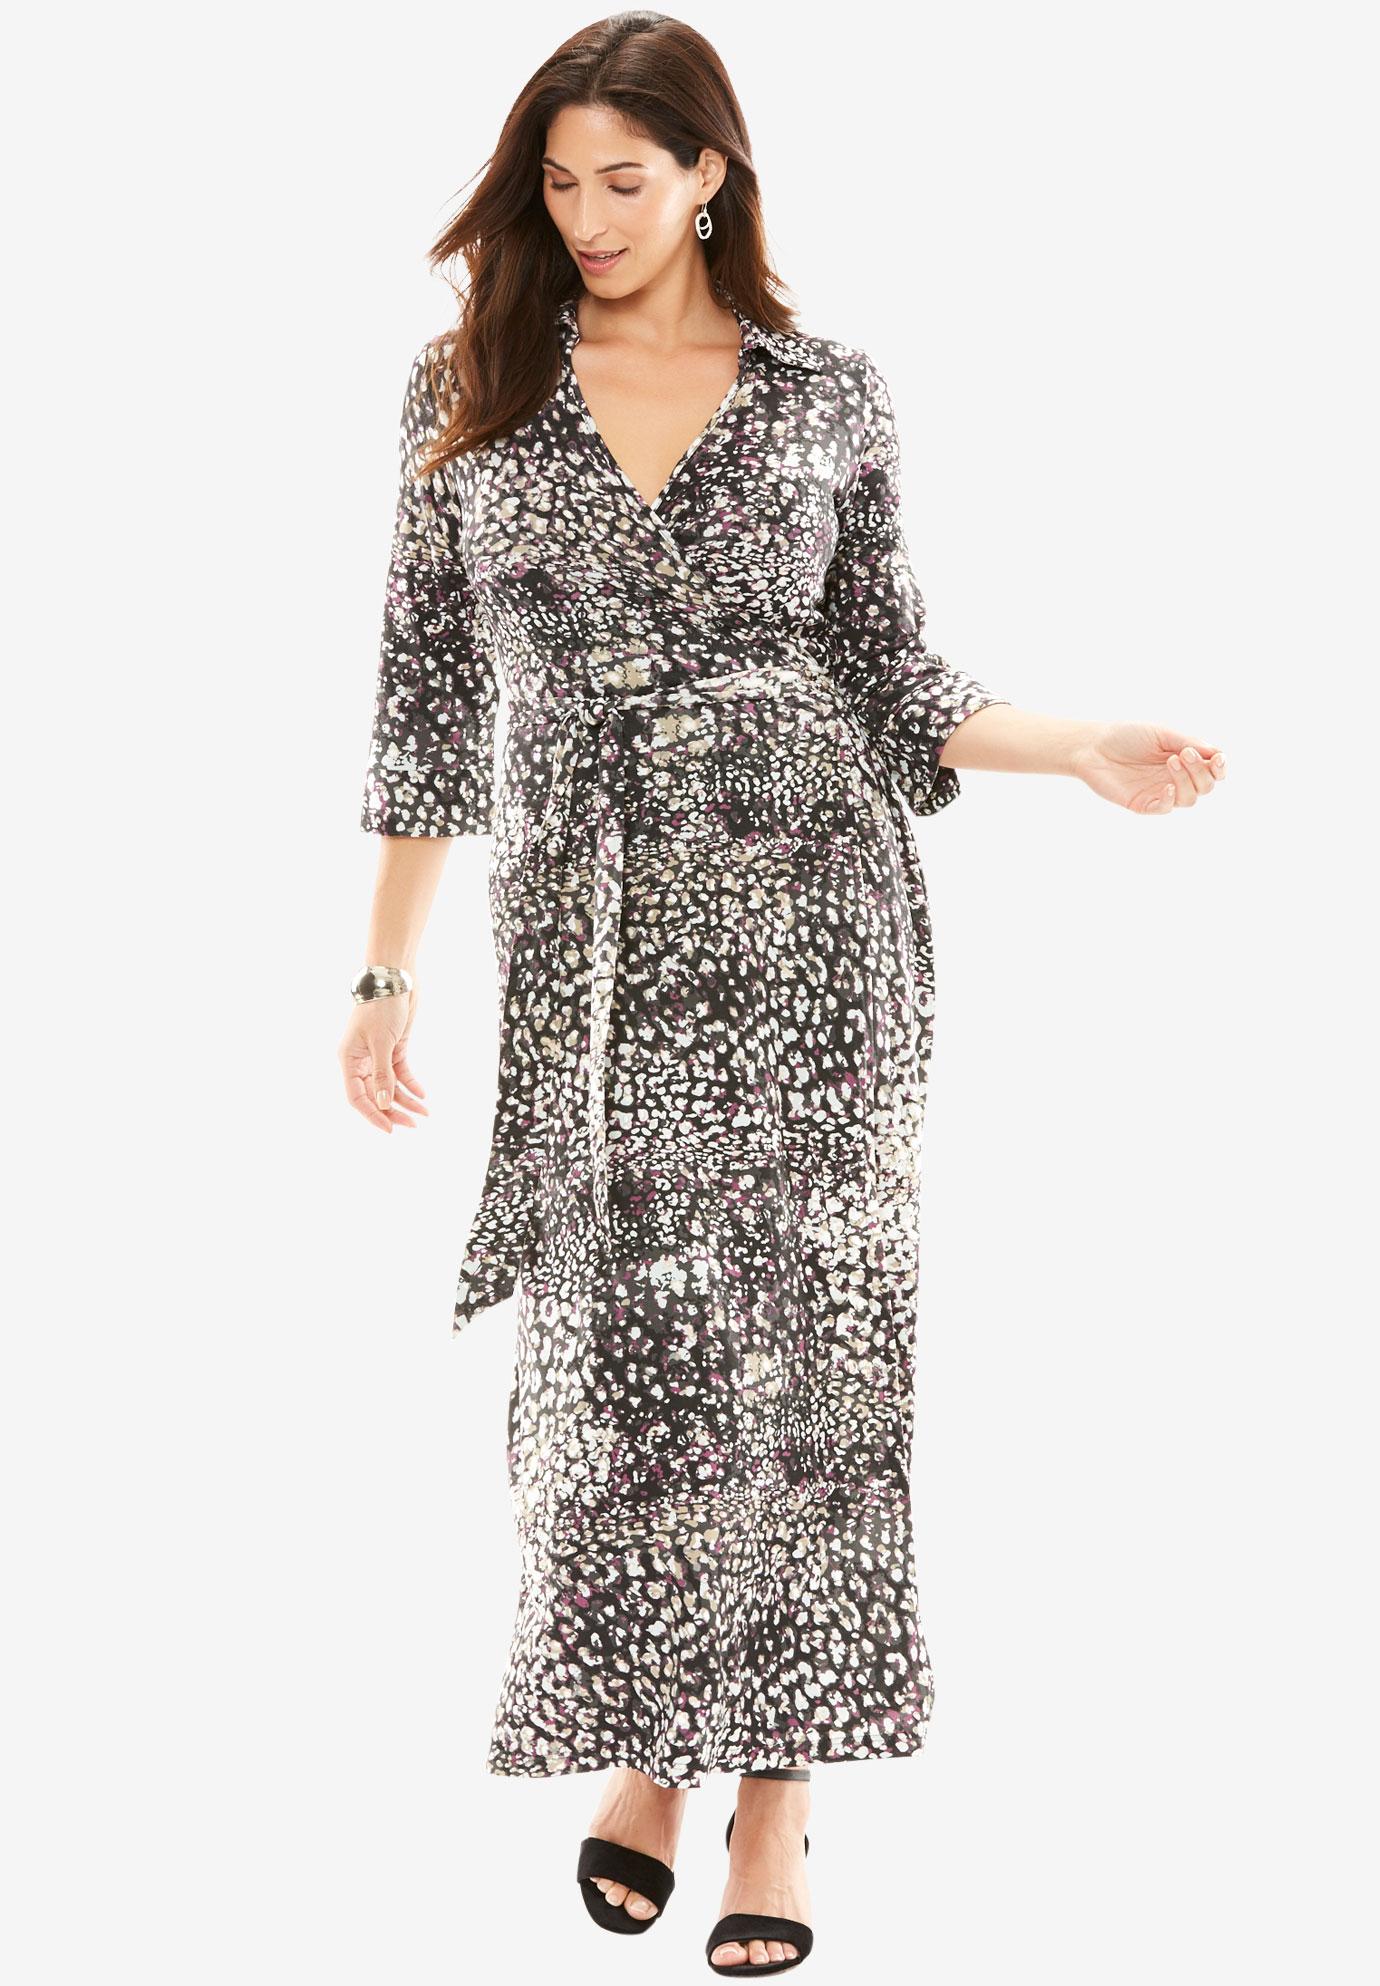 Wrap Style Maxi Dress| Plus Size Dresses | Jessica London